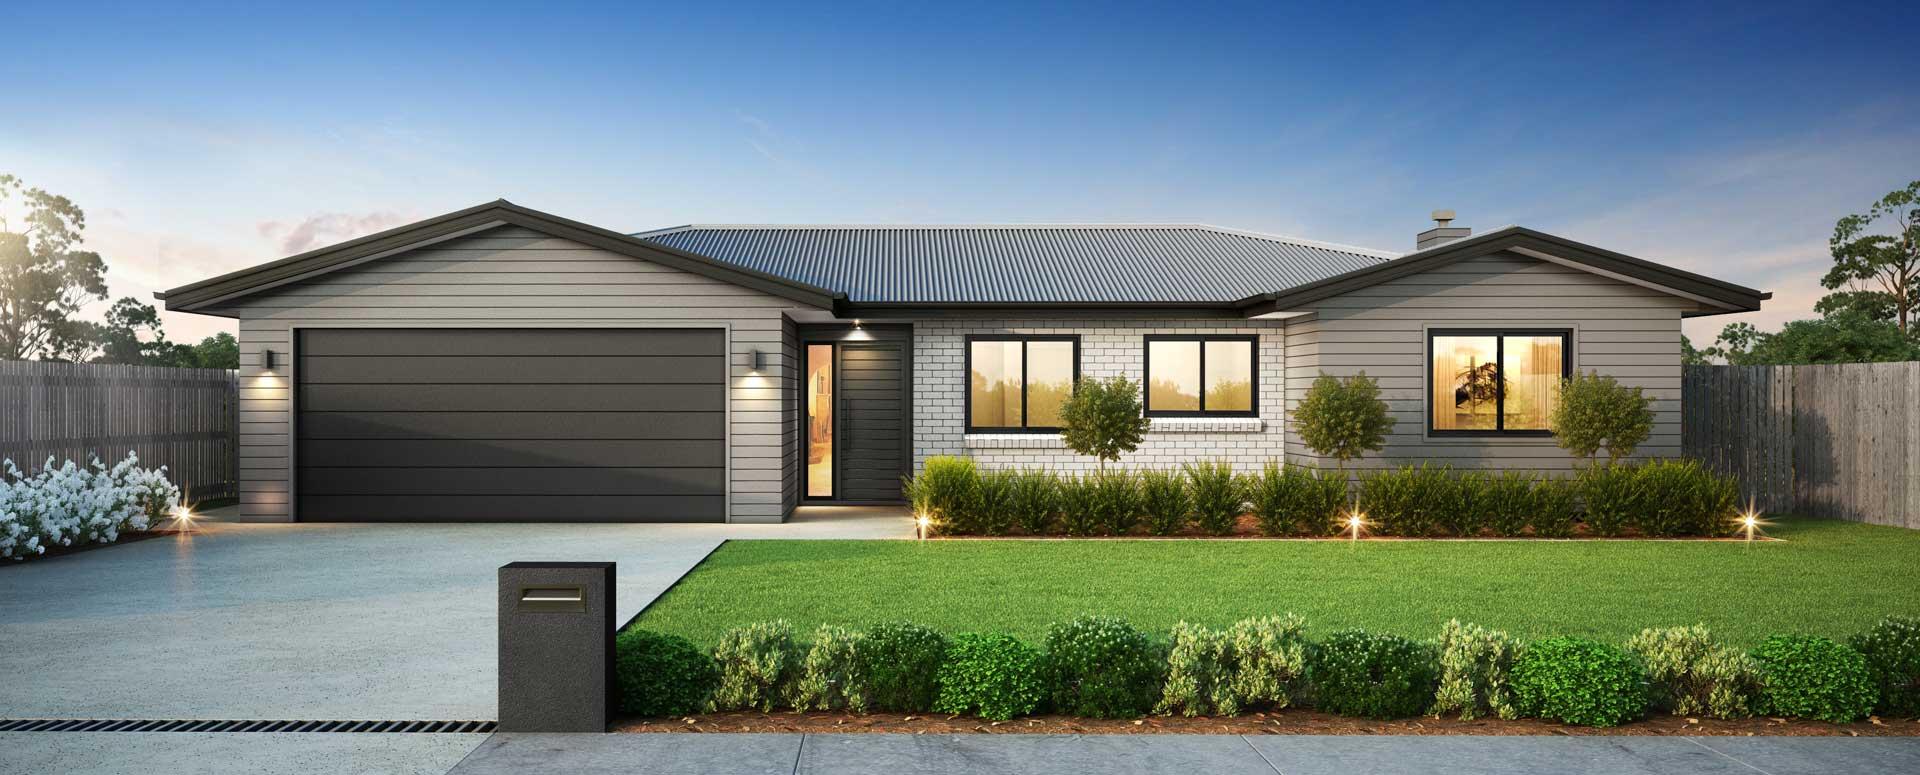 Lauregan Penny Homes Banner Image